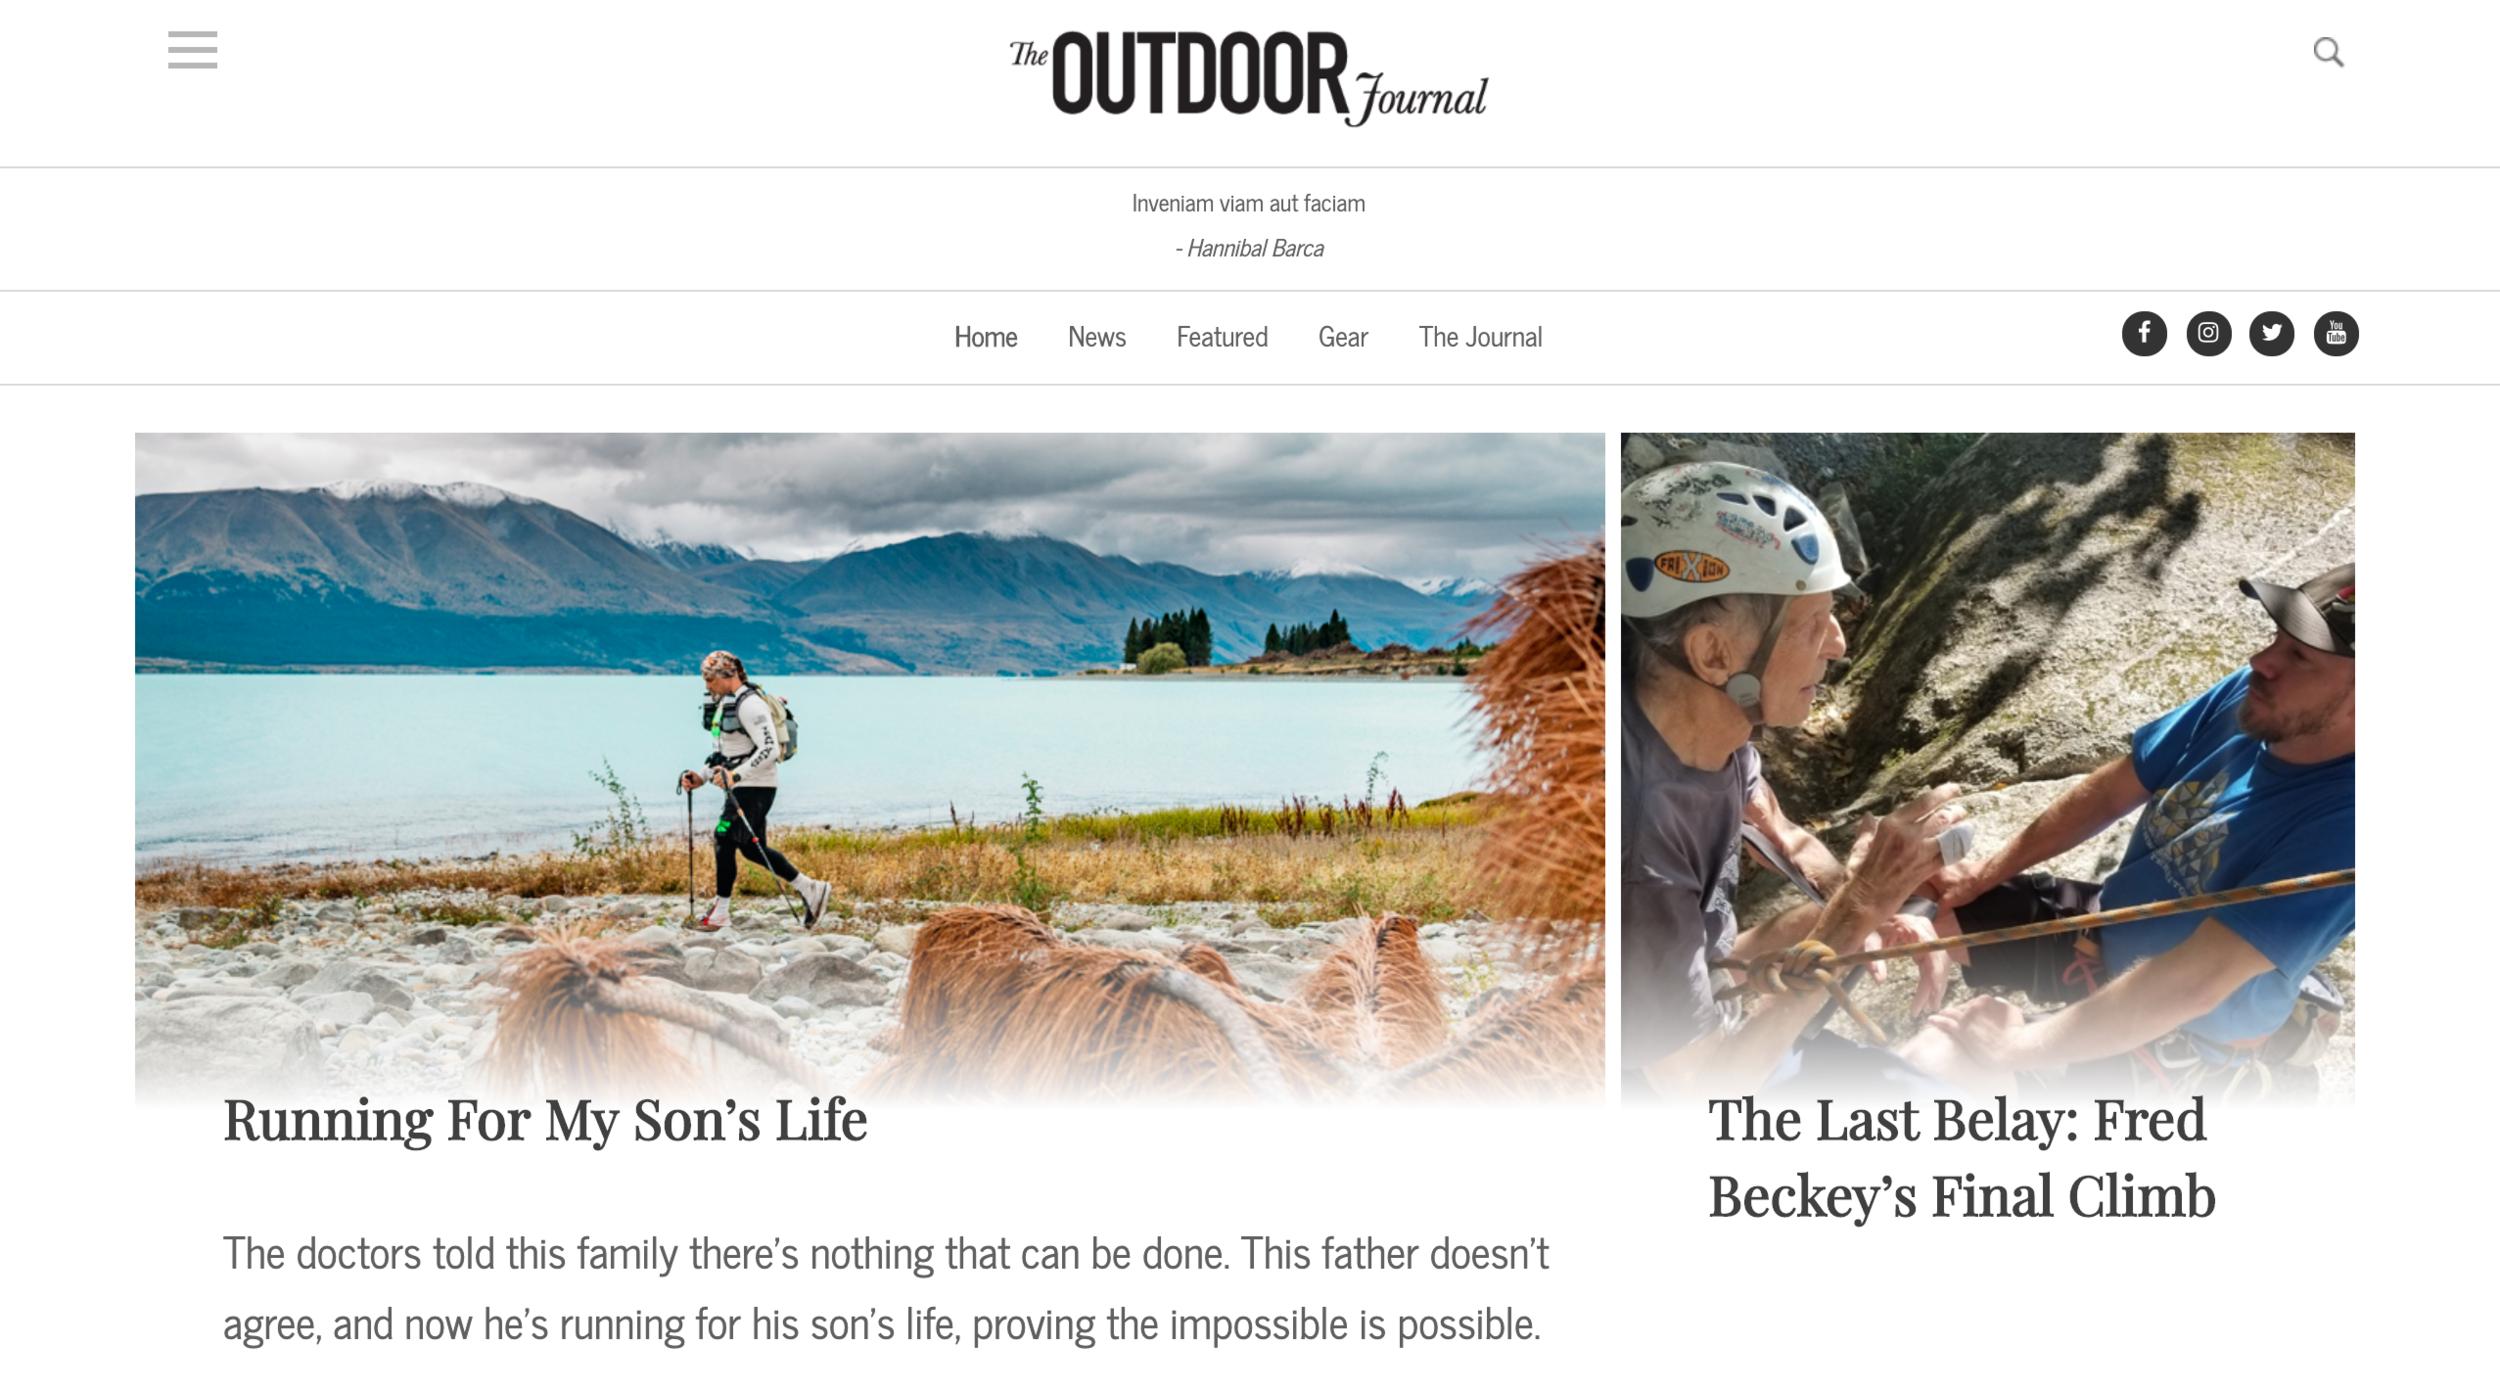 The Outdoor Journal 2019